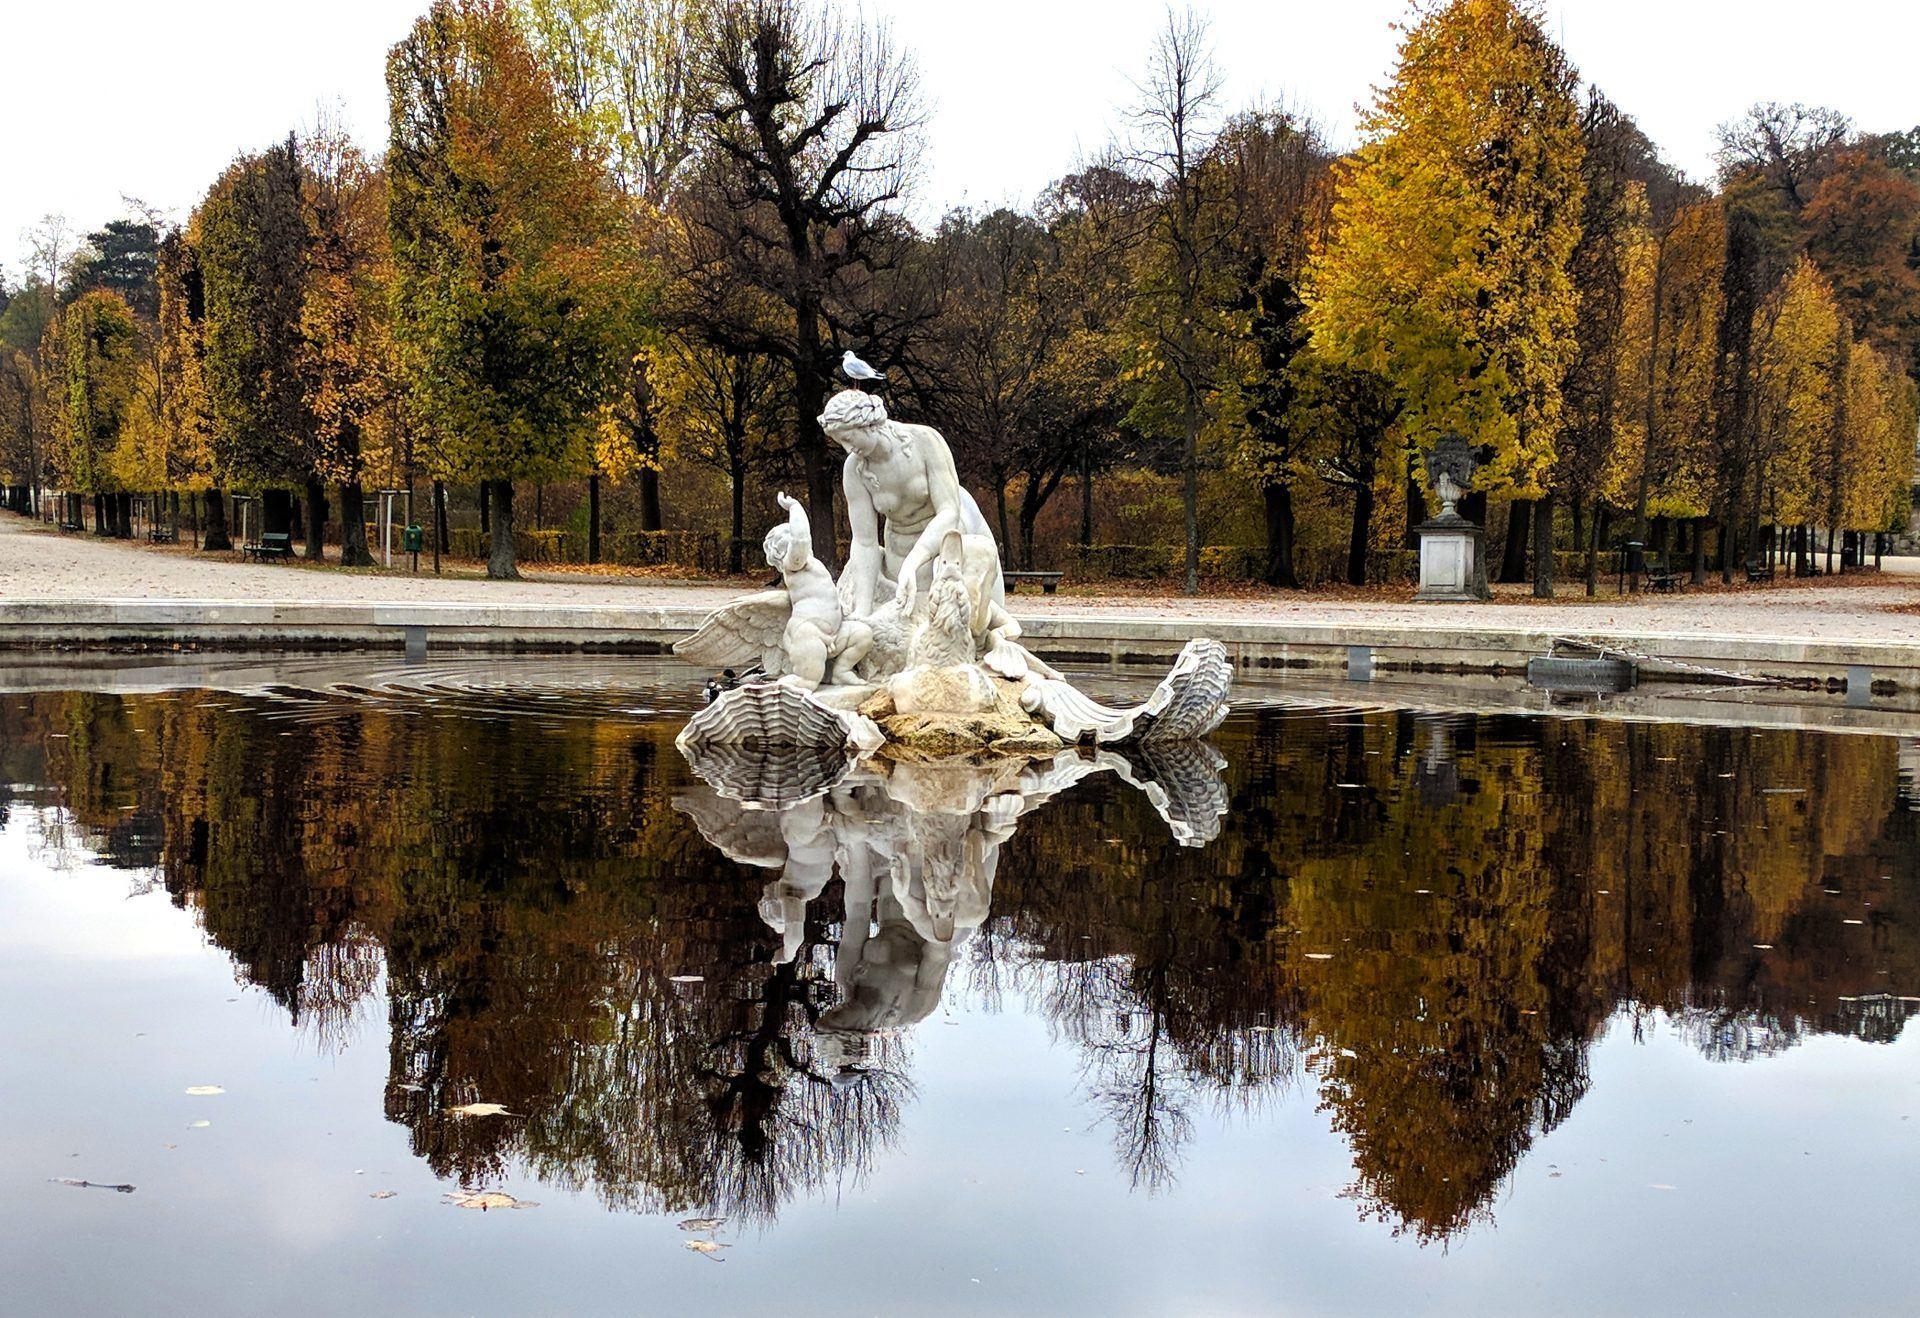 Vienna, Austria with autumn foliage is beautiful.